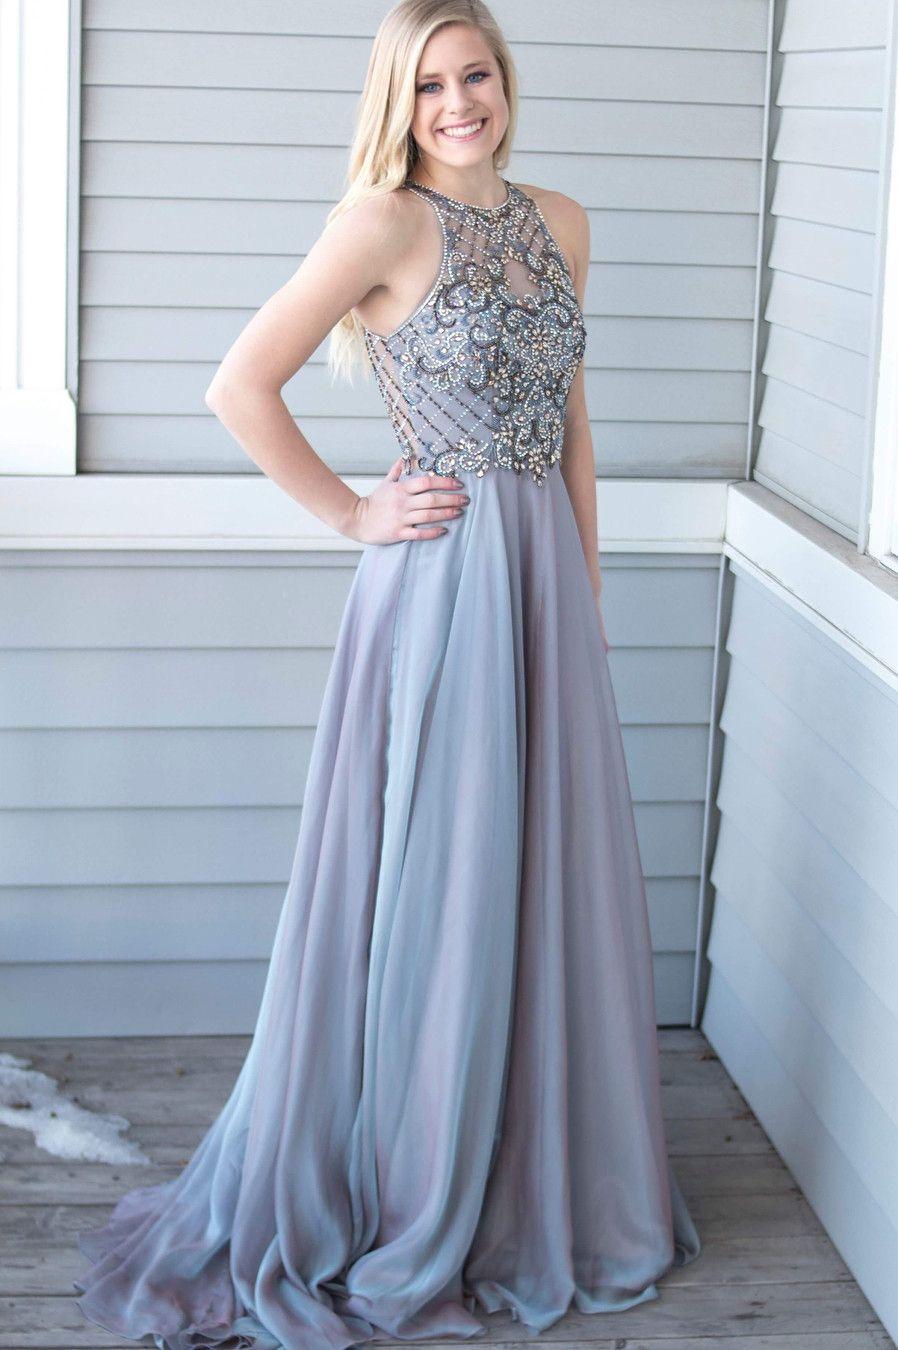 Luxurious Beads Grey Chiffon Long Prom Dress | Prom dresses ...